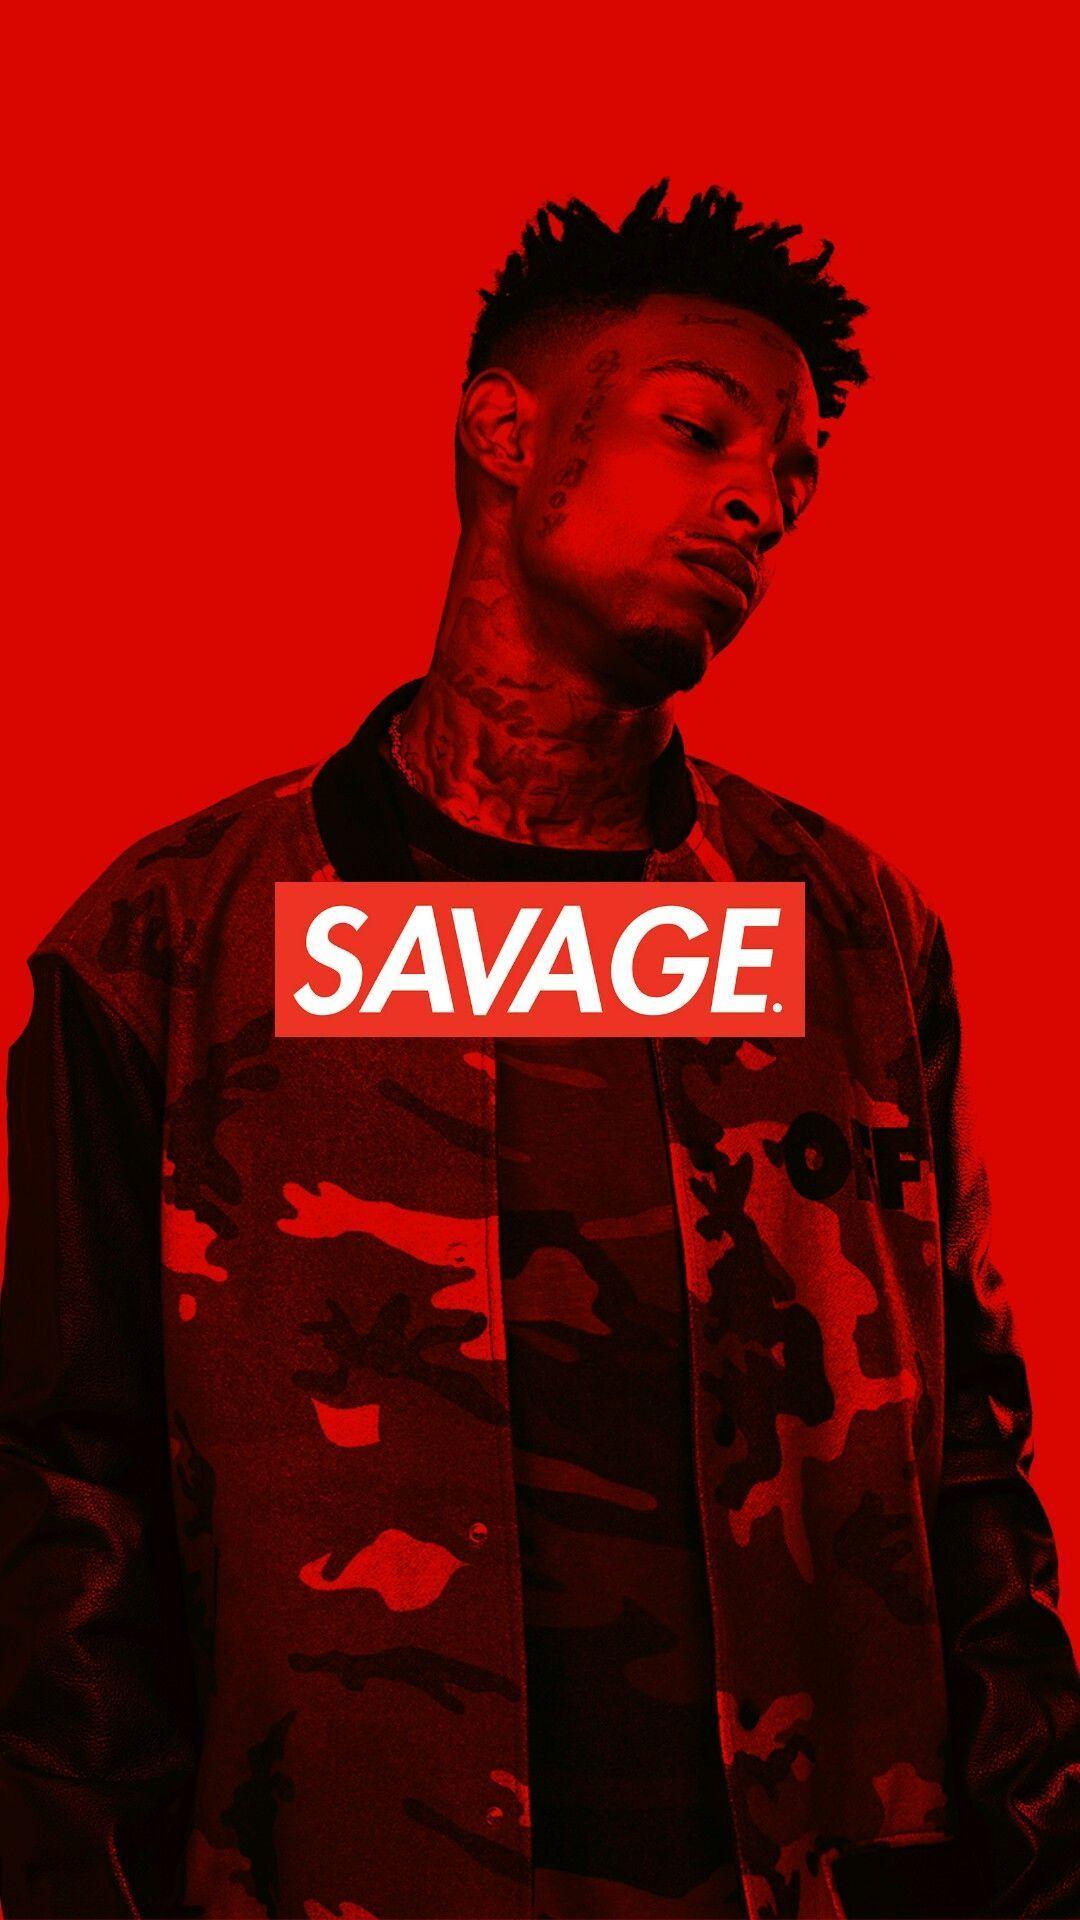 21 savage album cover wallpapers on wallpaperdog 21 savage album cover wallpapers on